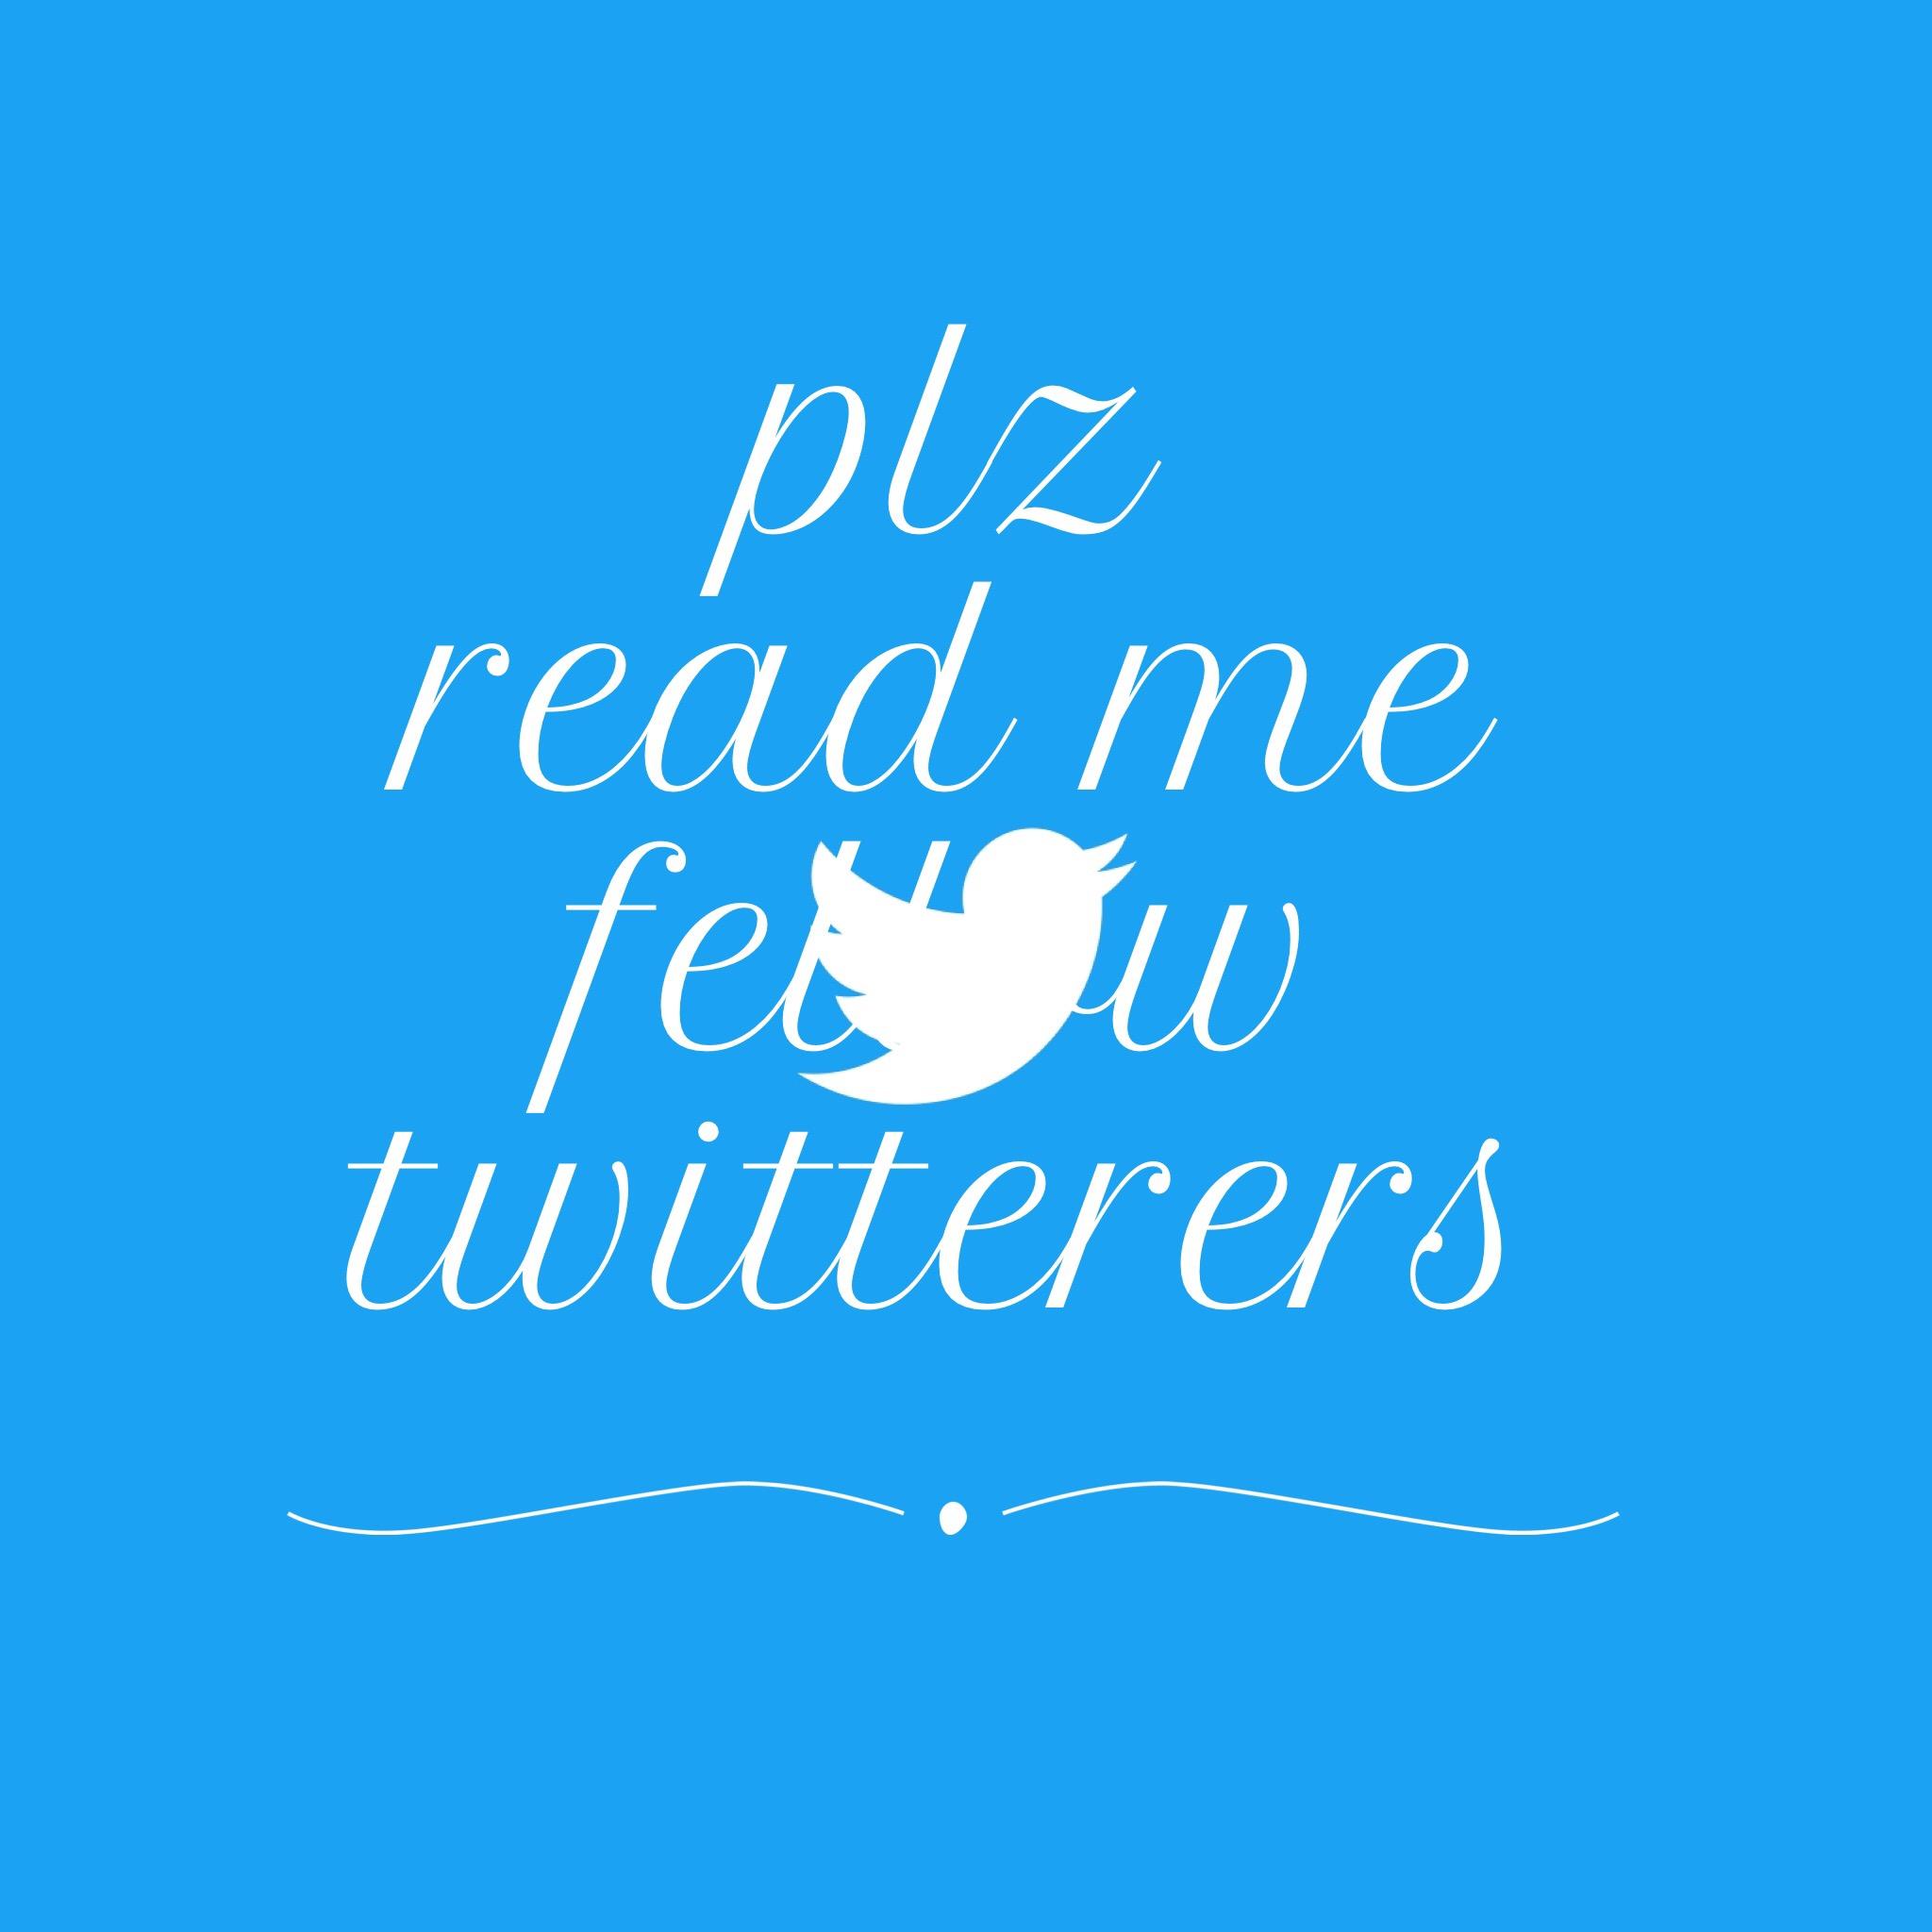 Practical Twitter tips